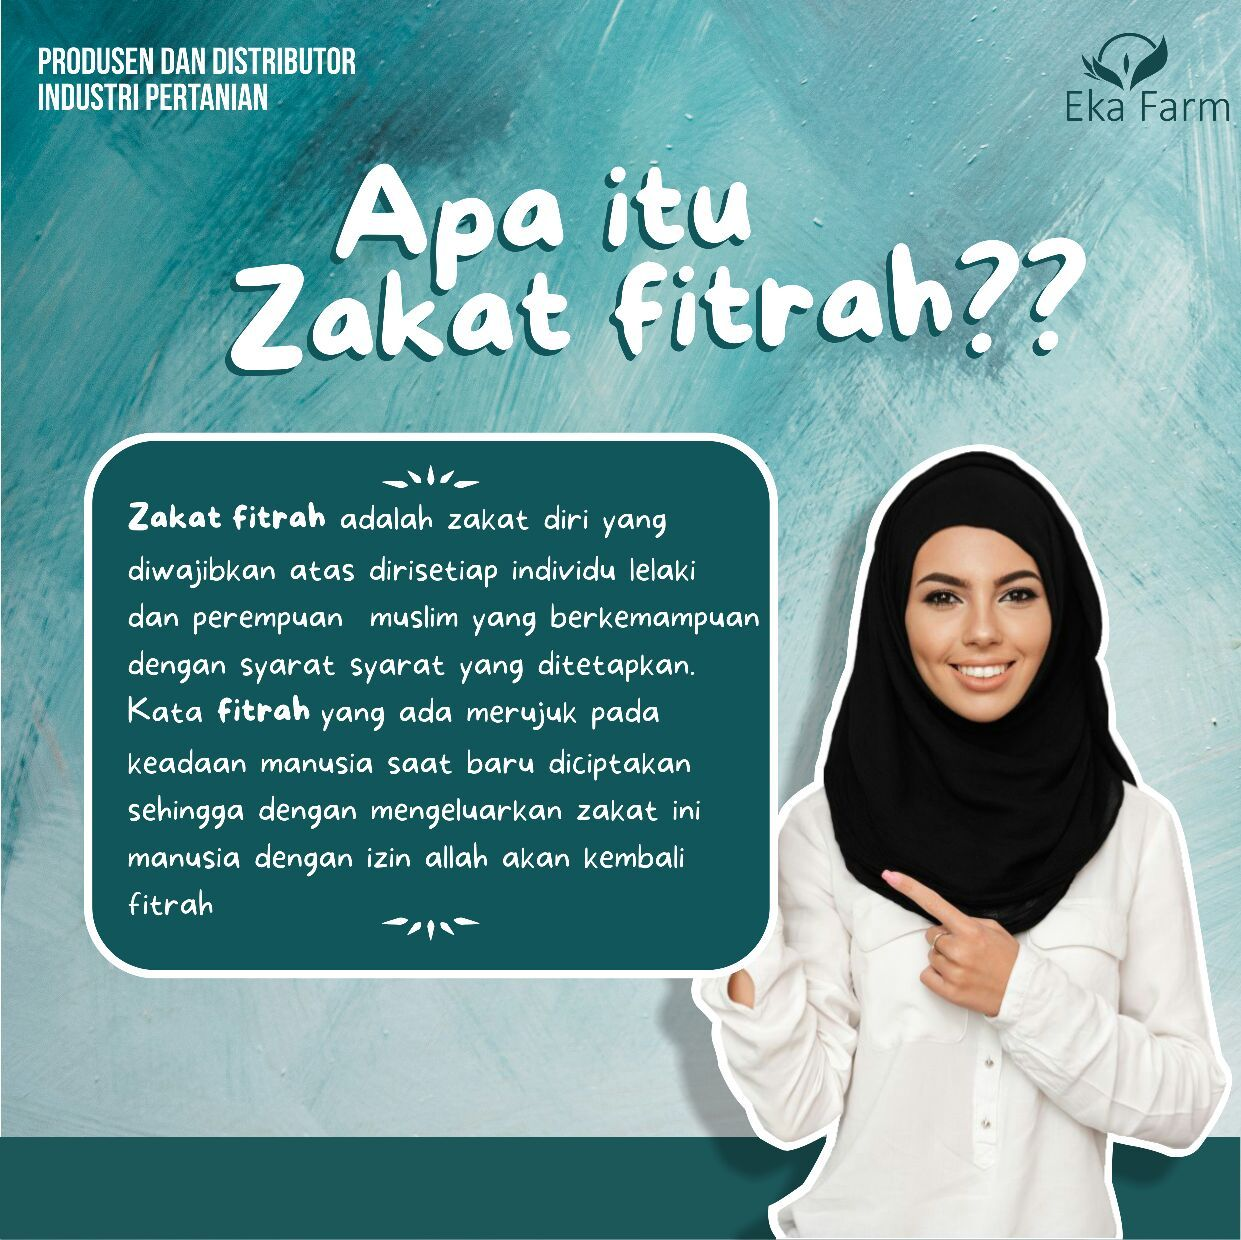 Zakat Fitrah Online Dengan Gambar Manusia